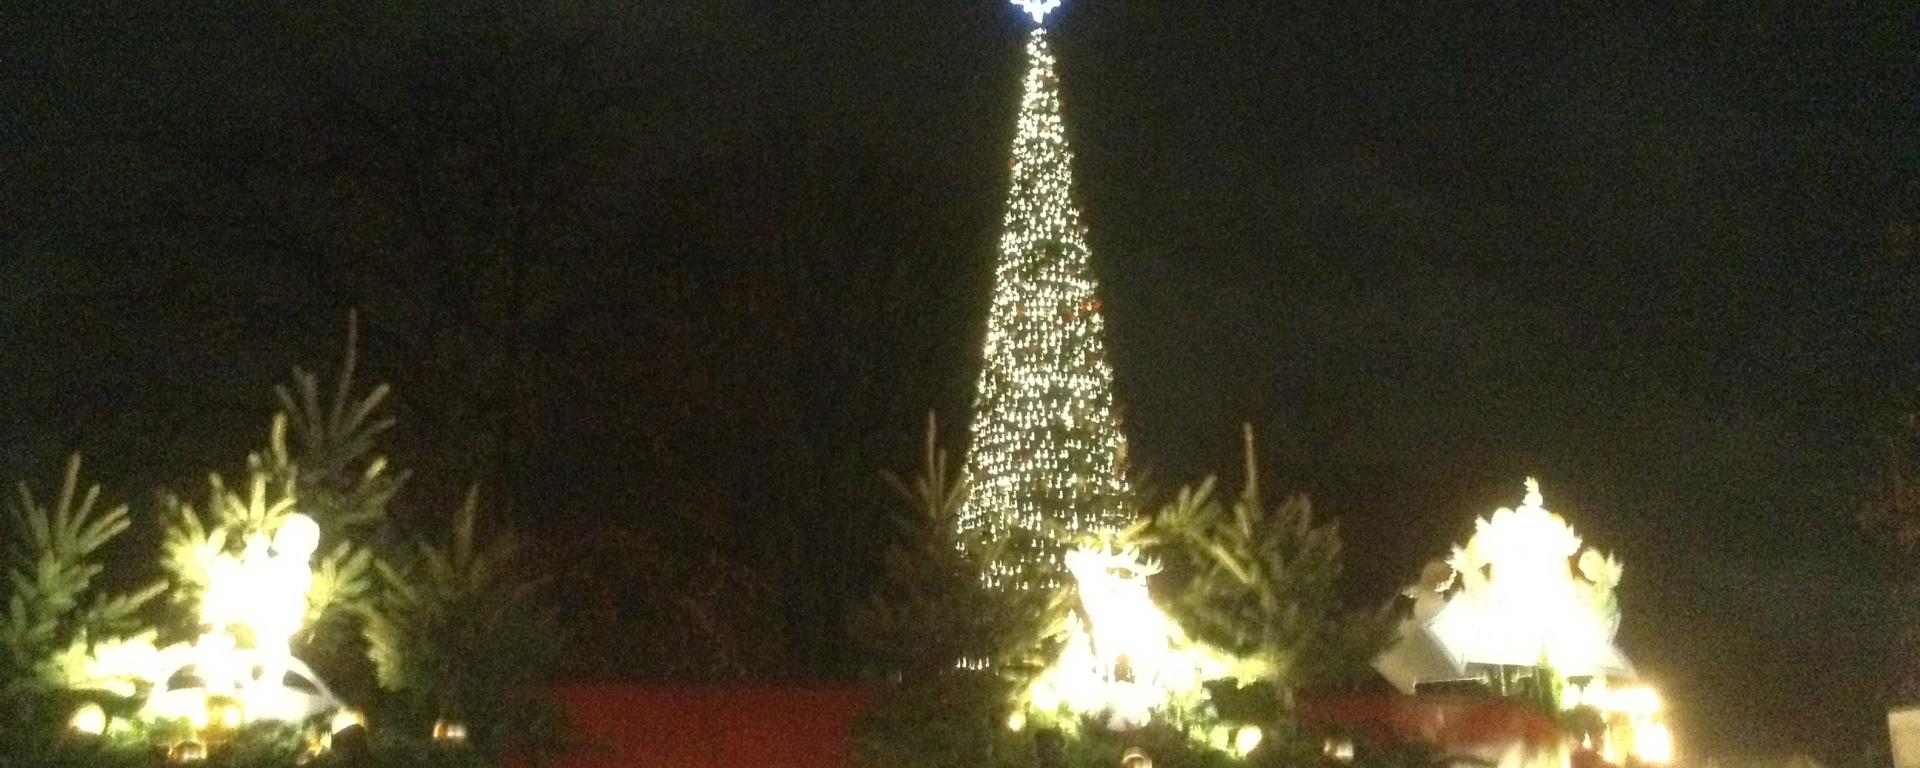 christmas tree winter wonderland hyde park